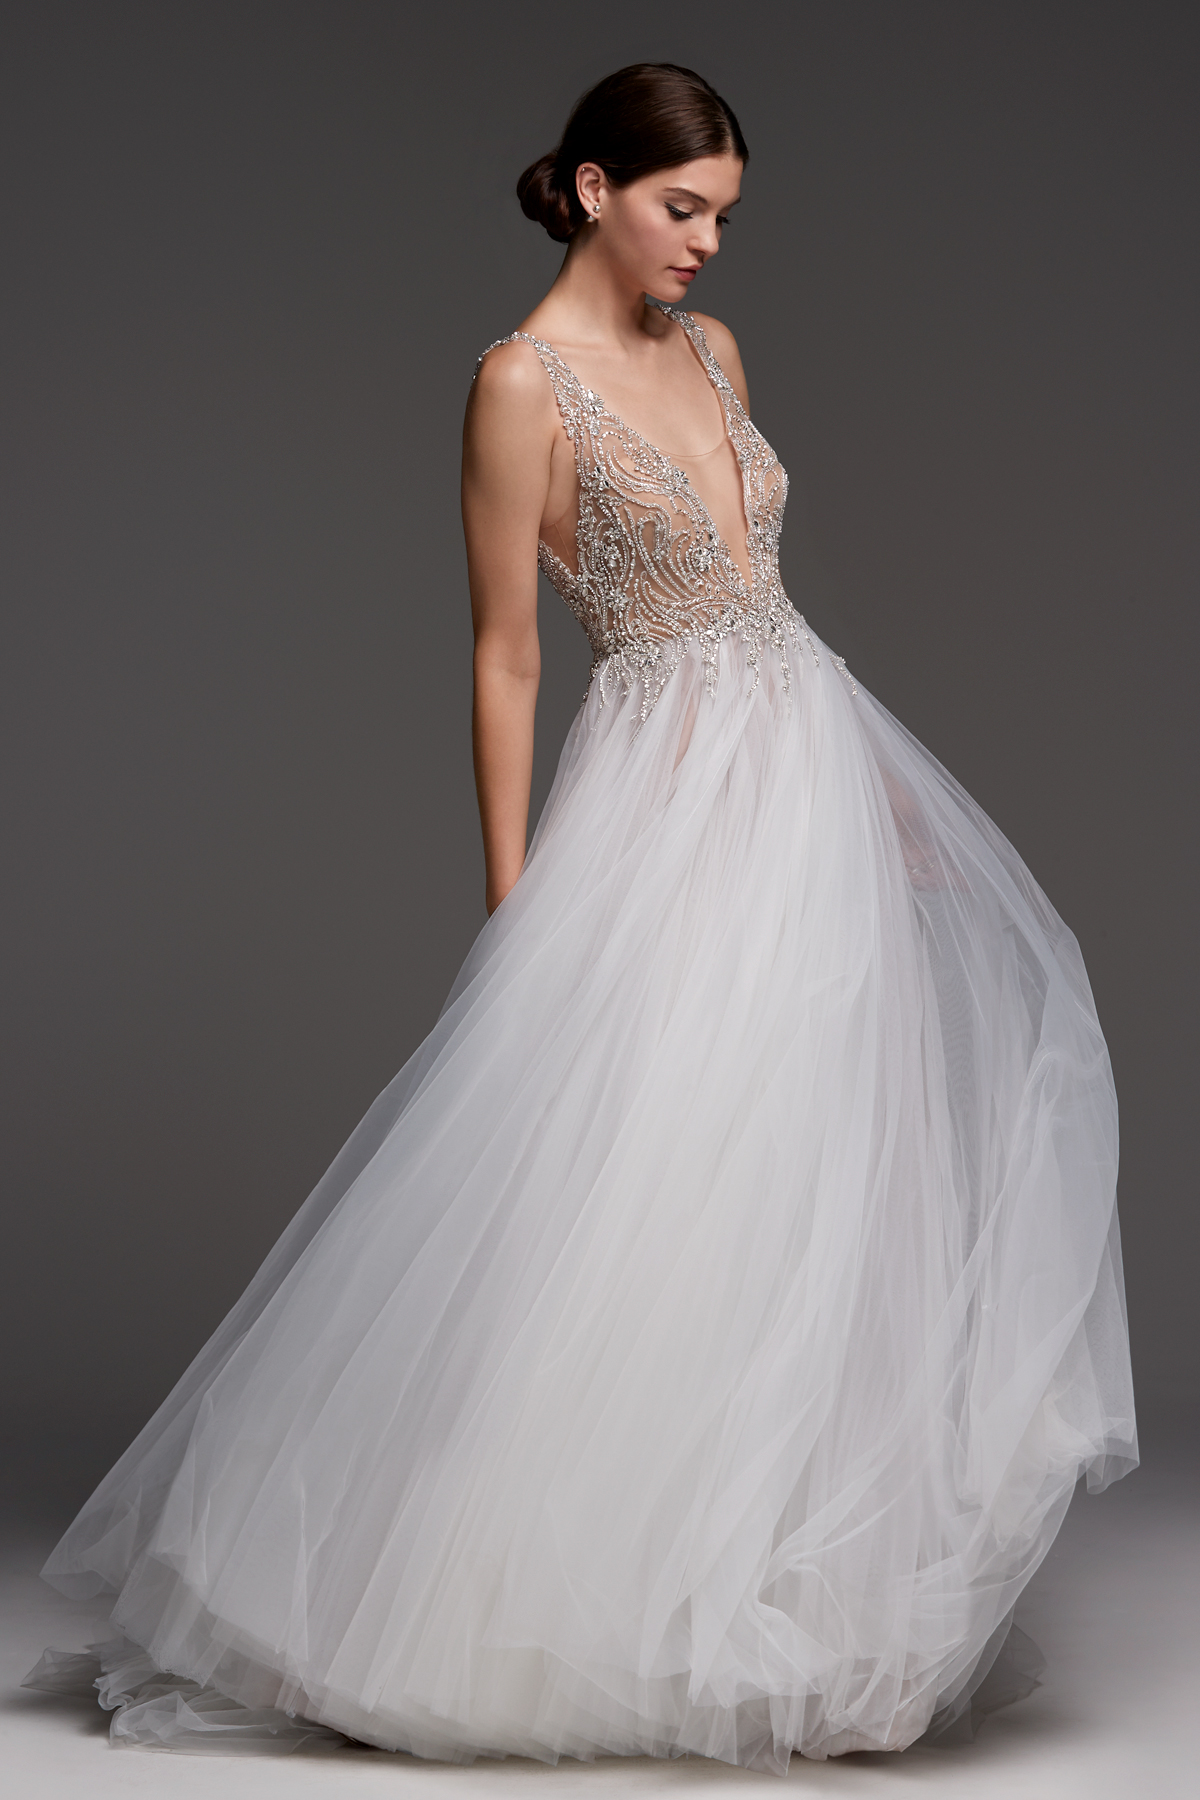 watters wedding dress fall 2018 v-neck embellished tulle